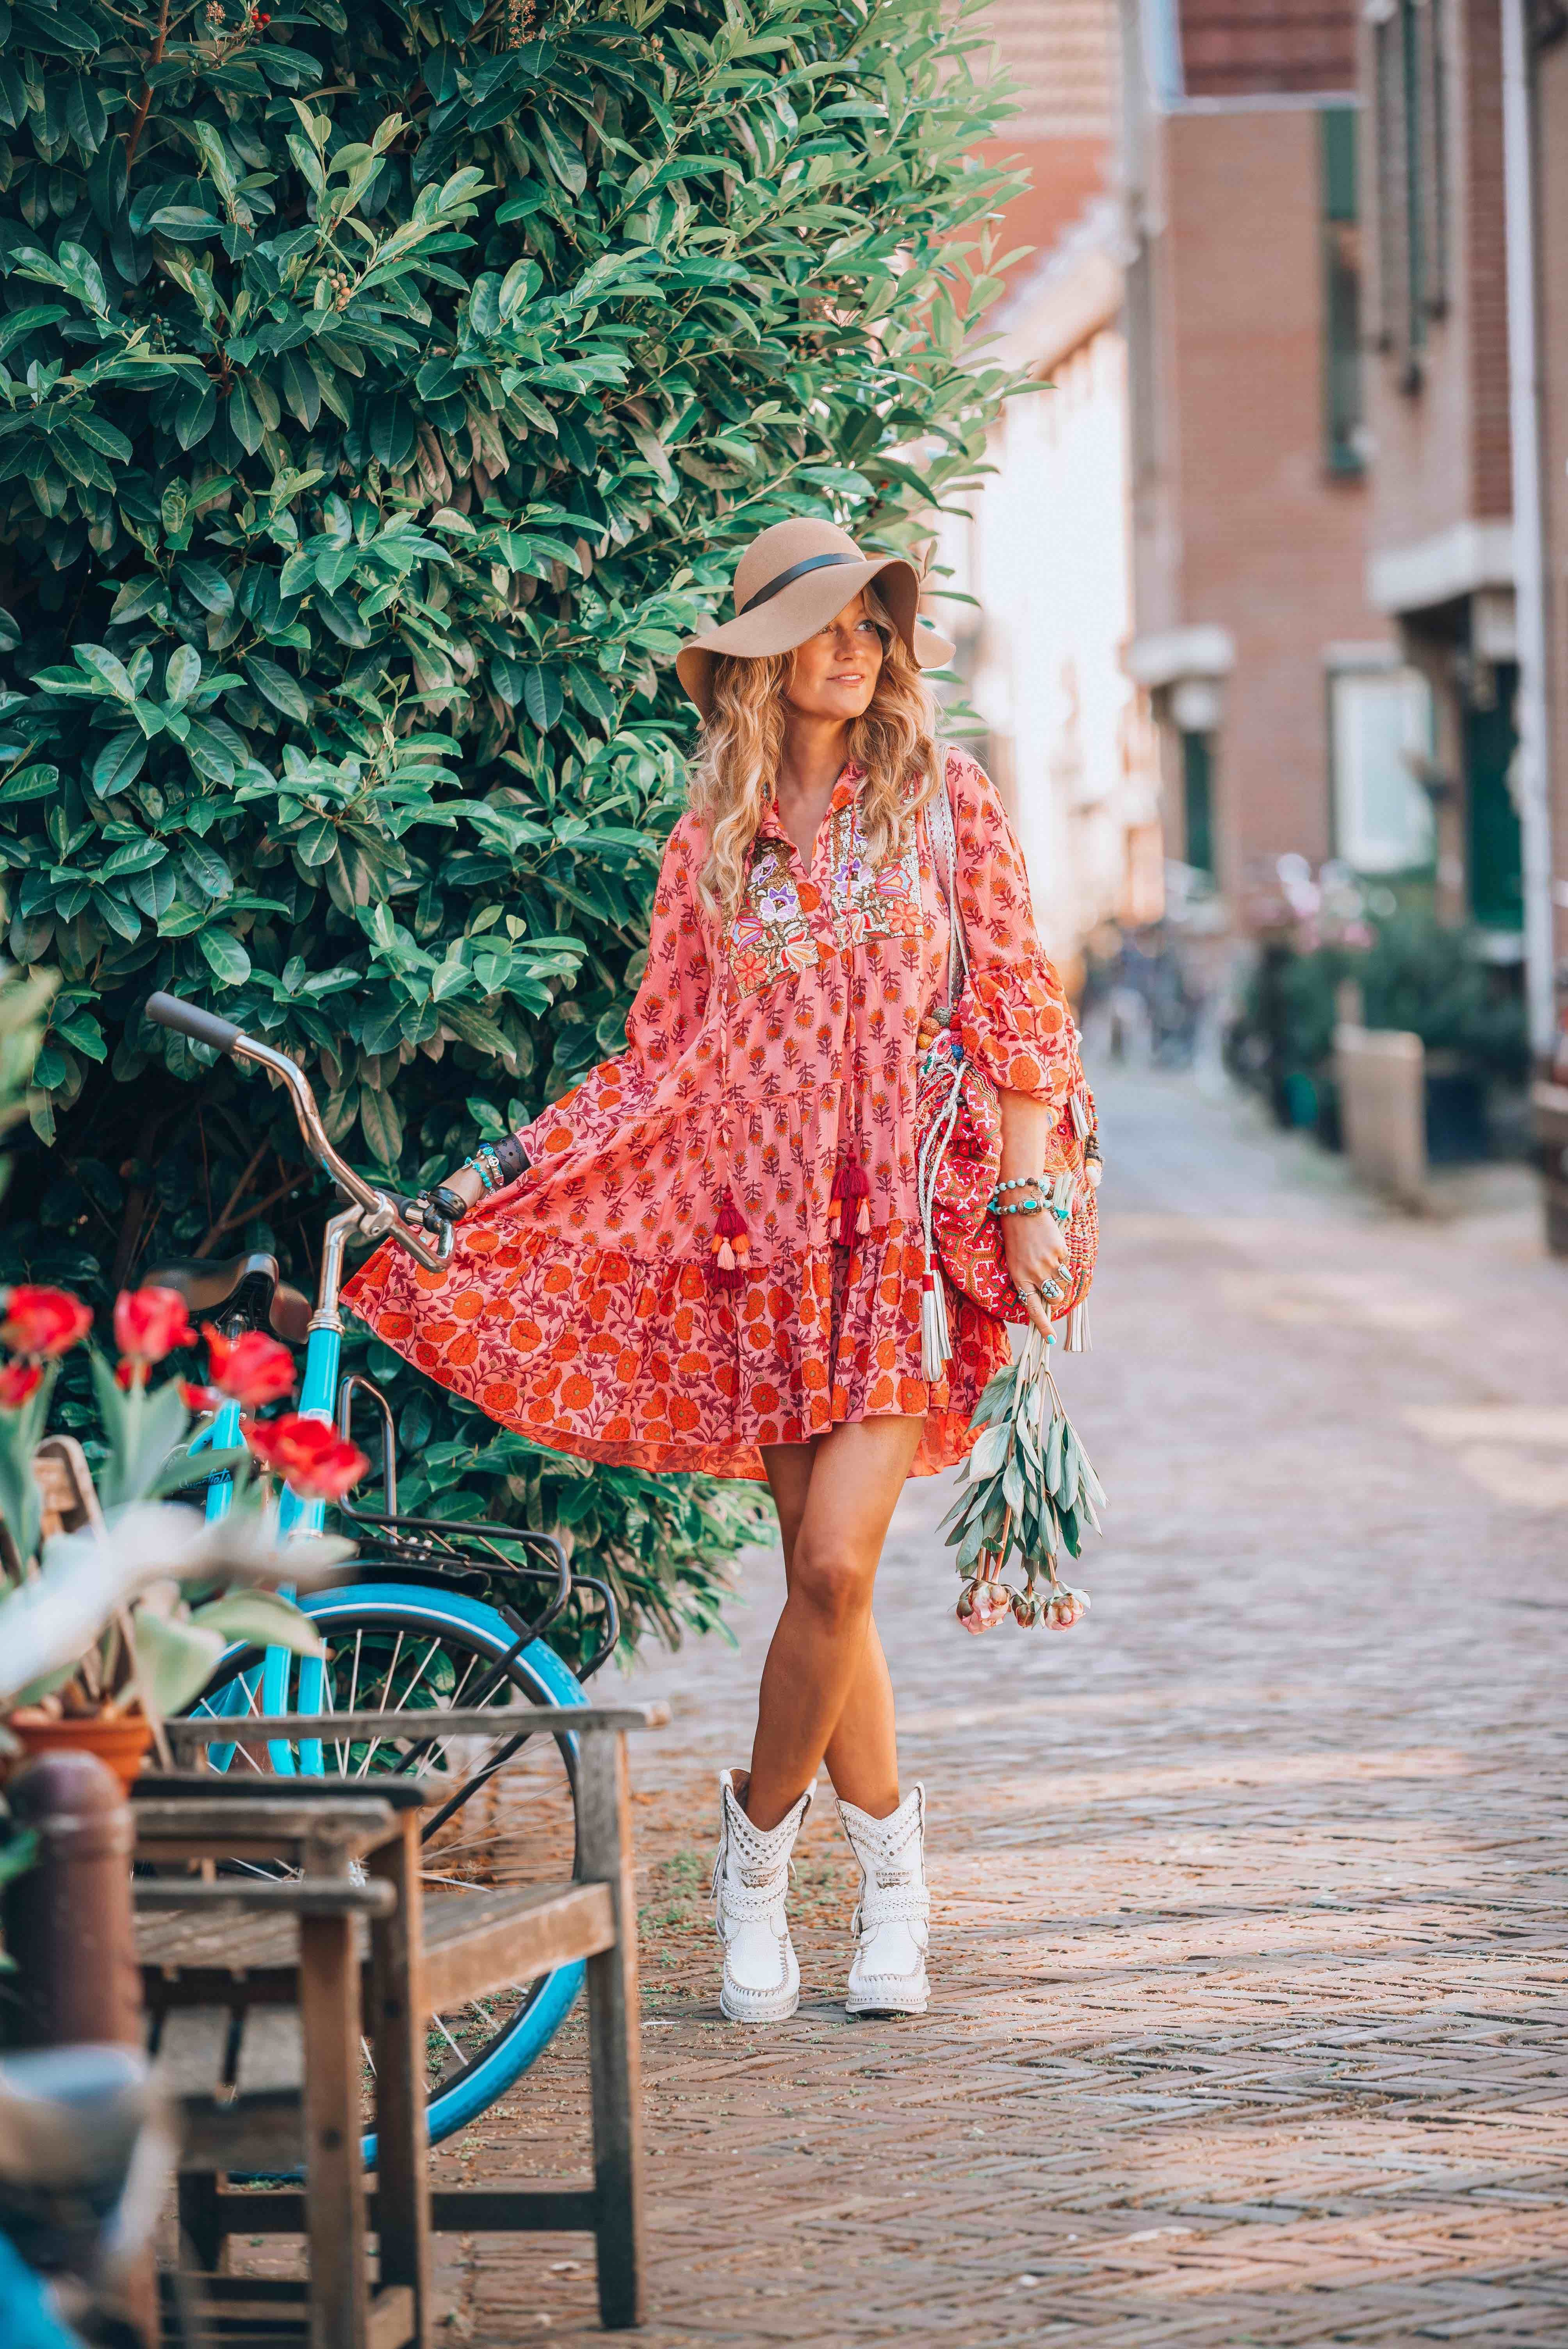 Ibizabohogirl In 2021 Boho Style Outfits Casual Boho Outfits Boho Outfits [ 6016 x 4016 Pixel ]